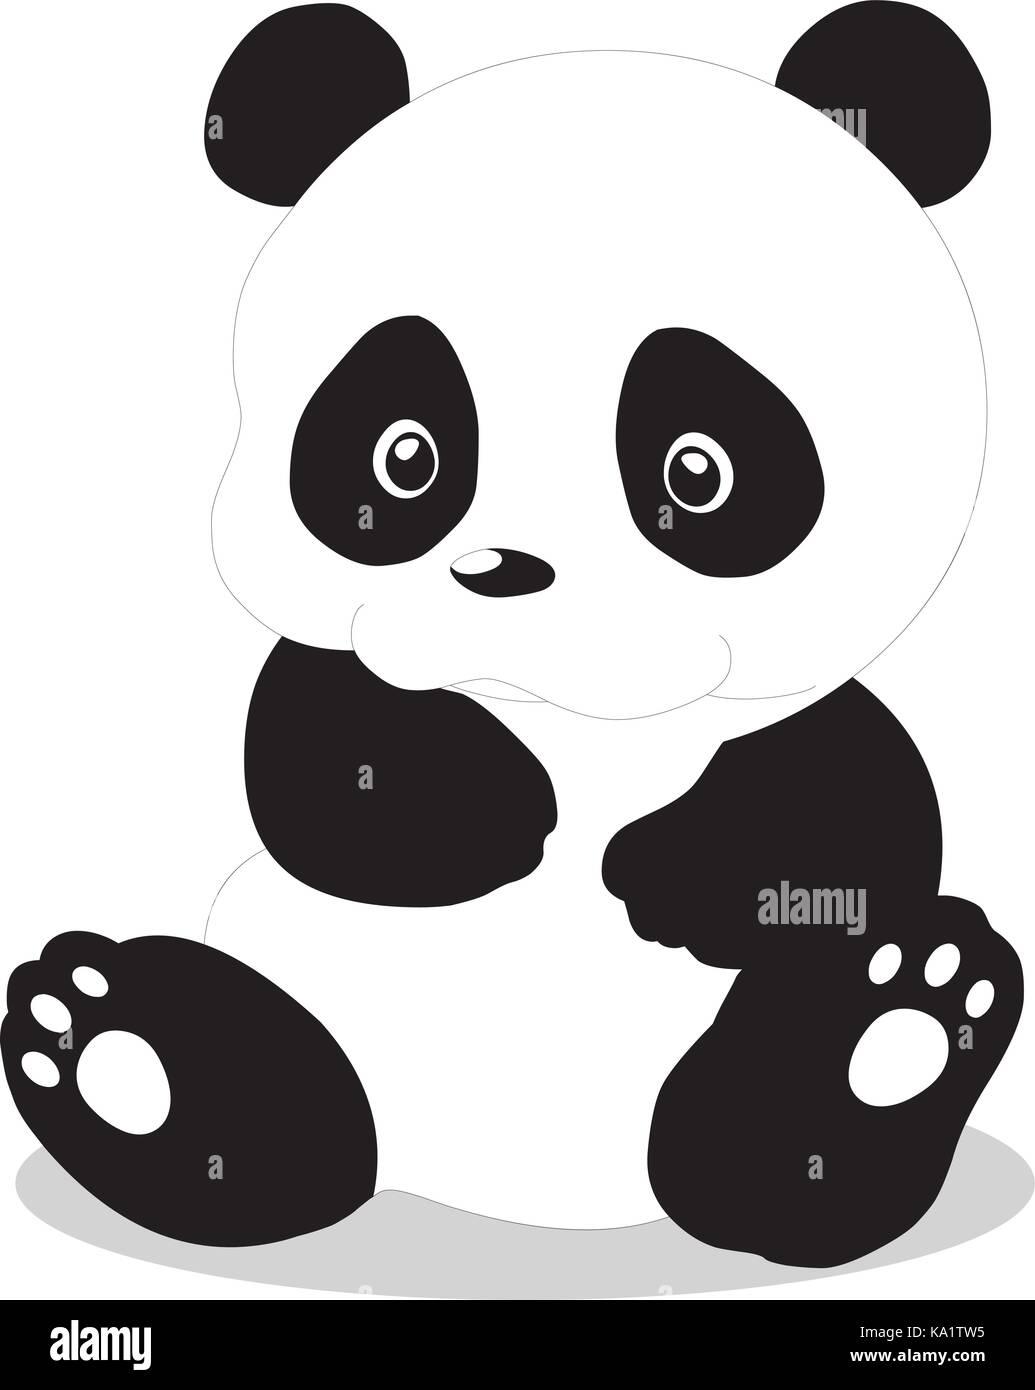 Cute Baby Panda Cartoon Stock Vector Art Illustration Vector